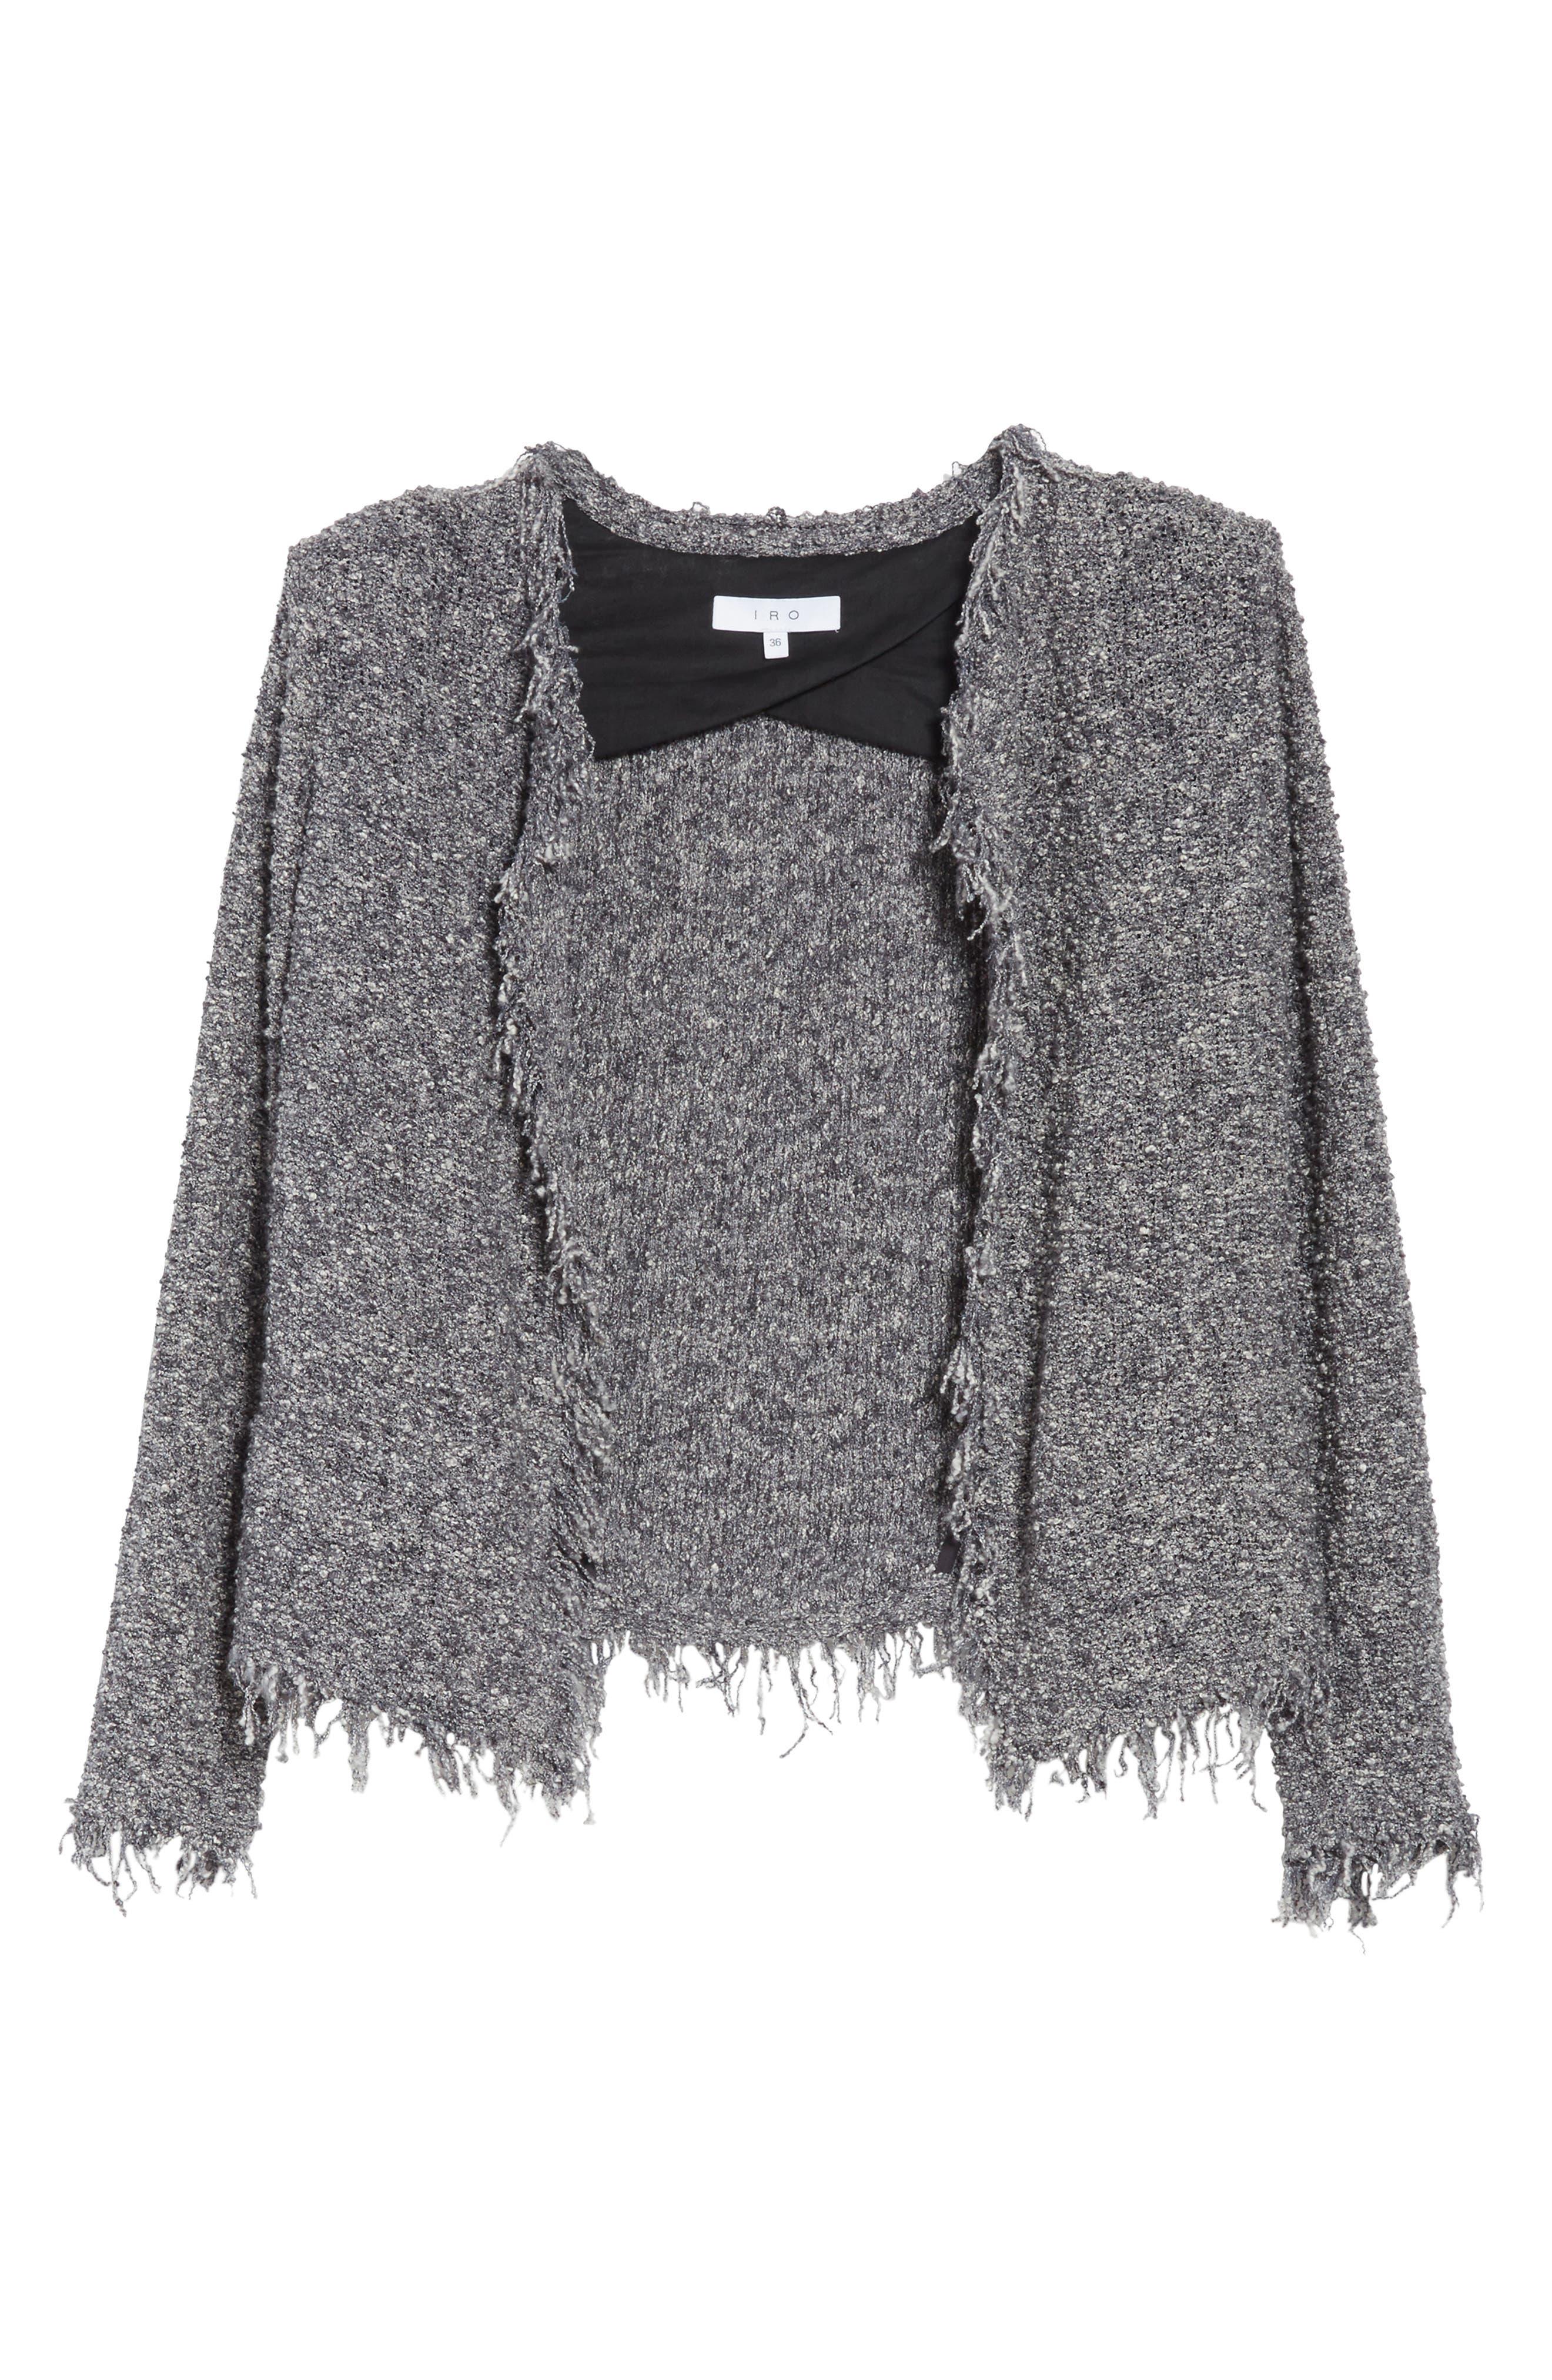 Shavanix Tweed Jacket,                             Alternate thumbnail 6, color,                             Dark Grey